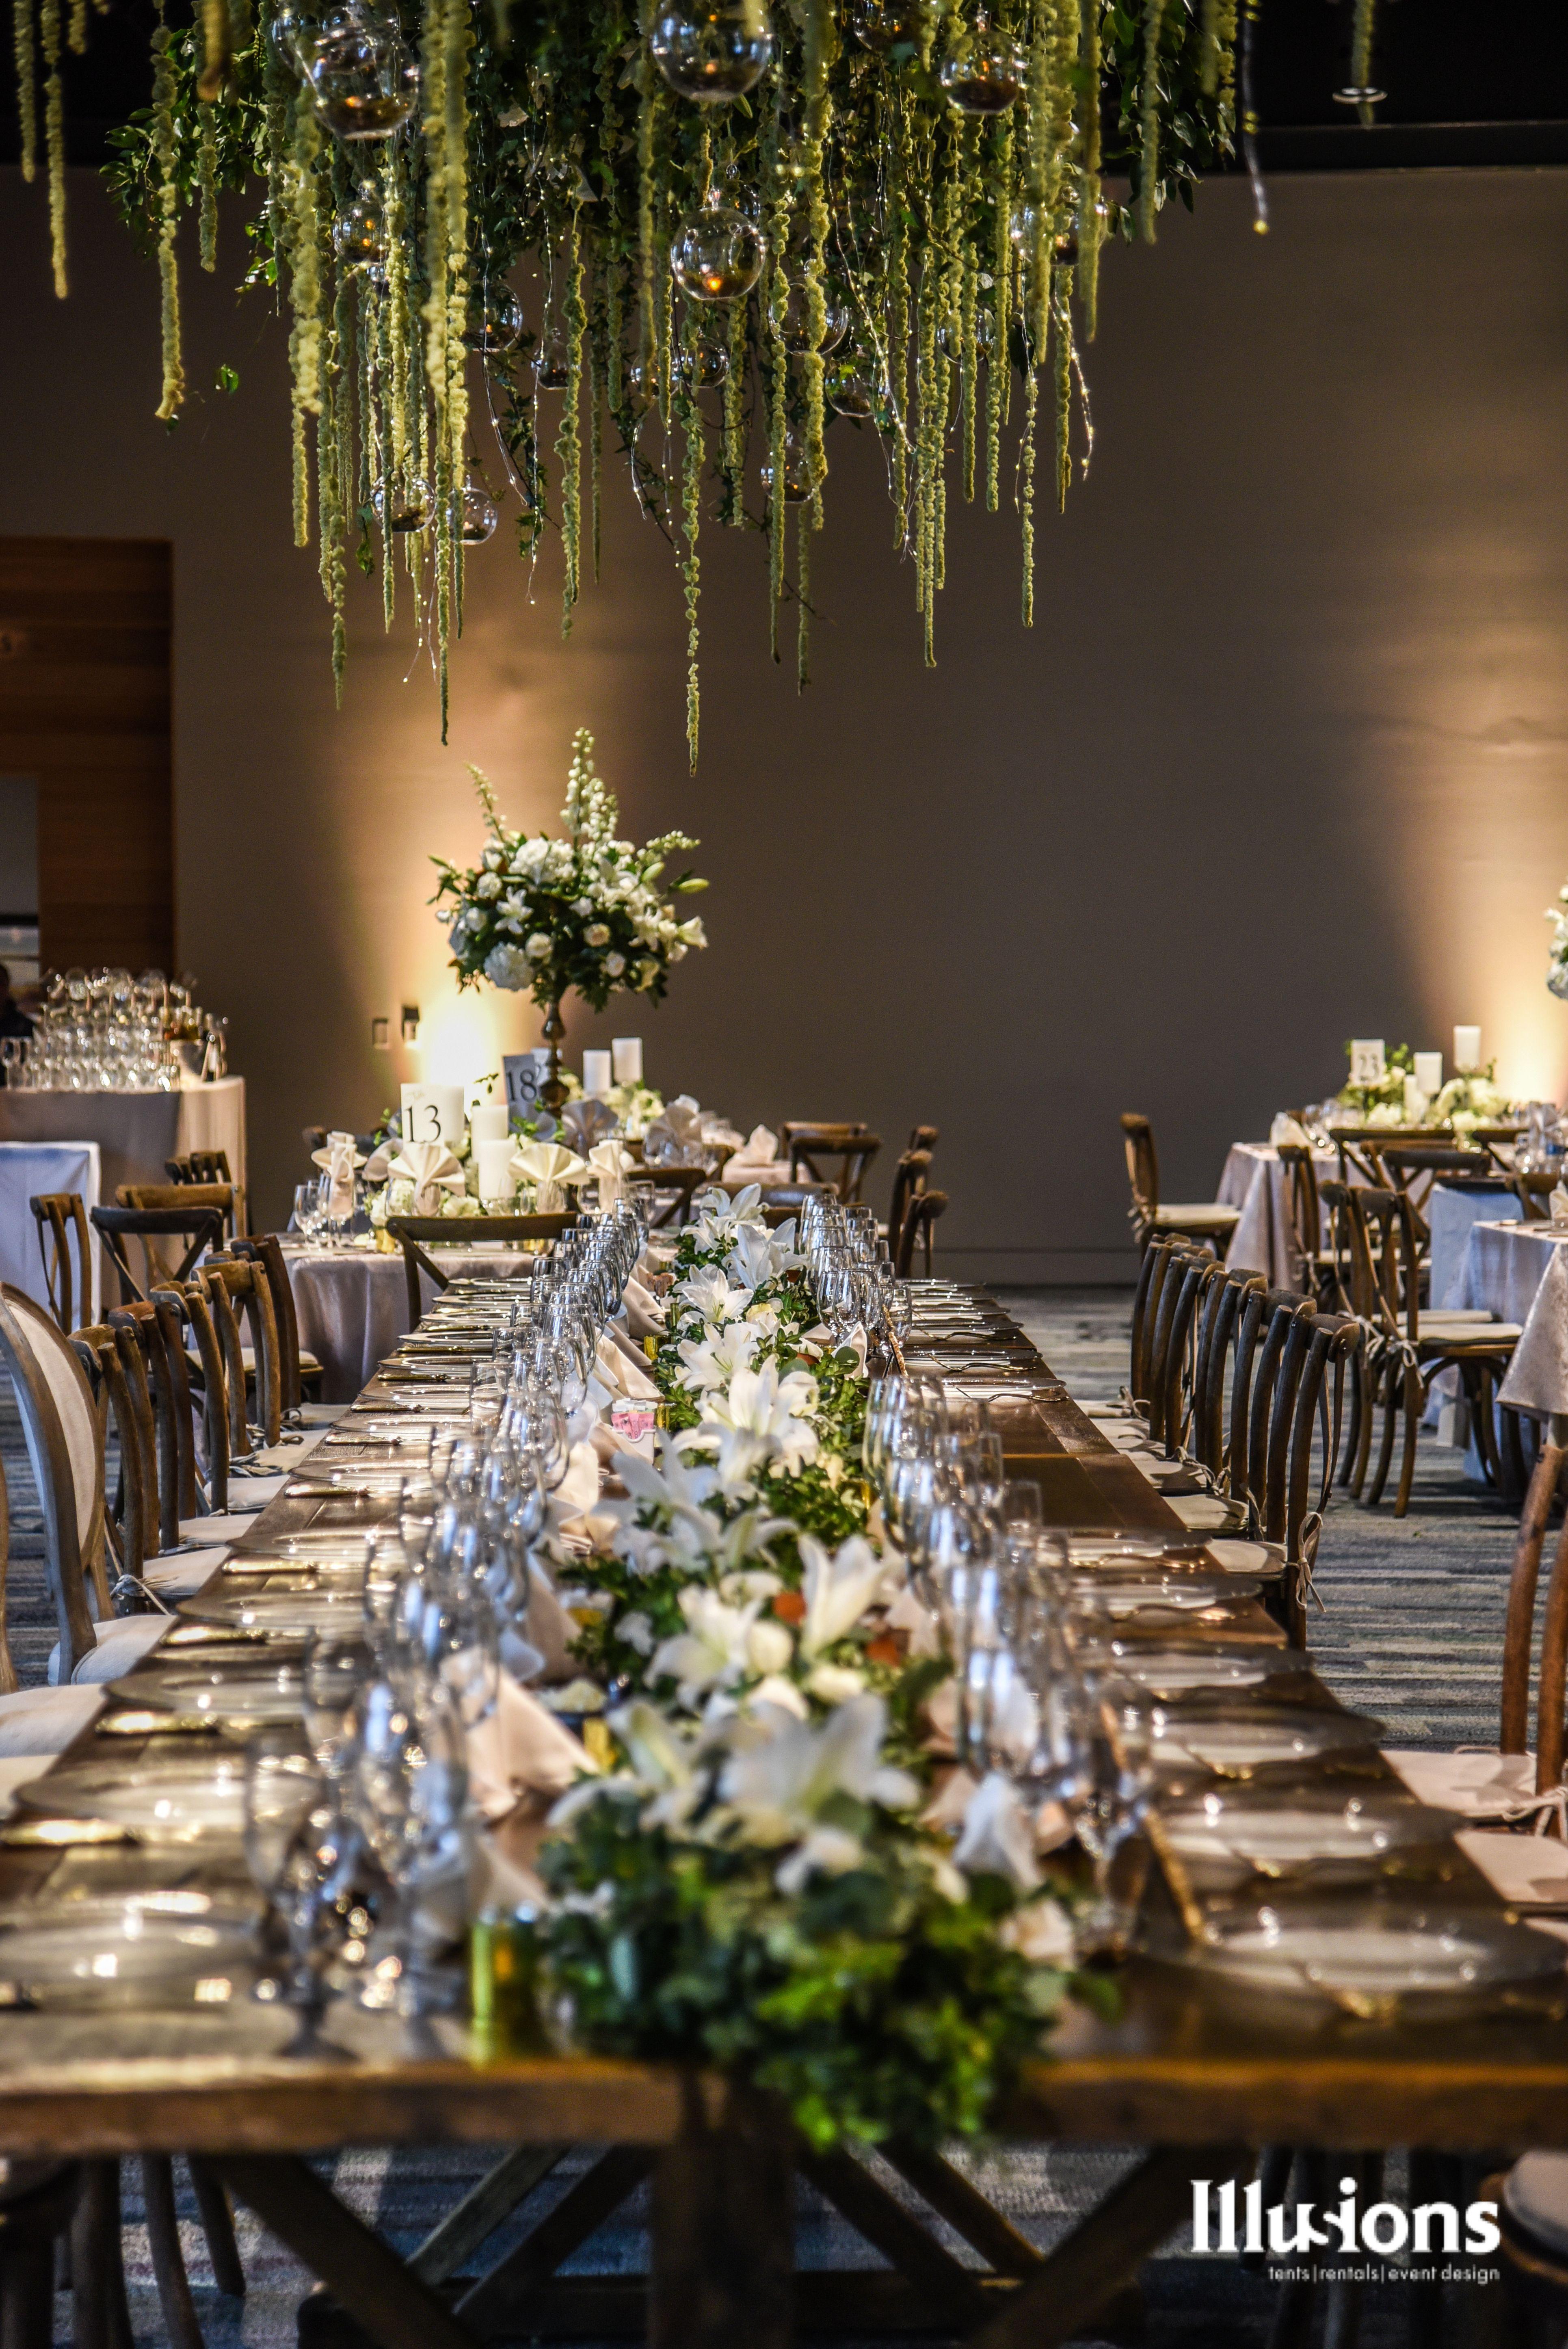 Weddings Brides Decor Dream Wedding Glamorous Wedding Rentals Wedding Rentals Wedding Rentals Event Design Glamorous Wedding